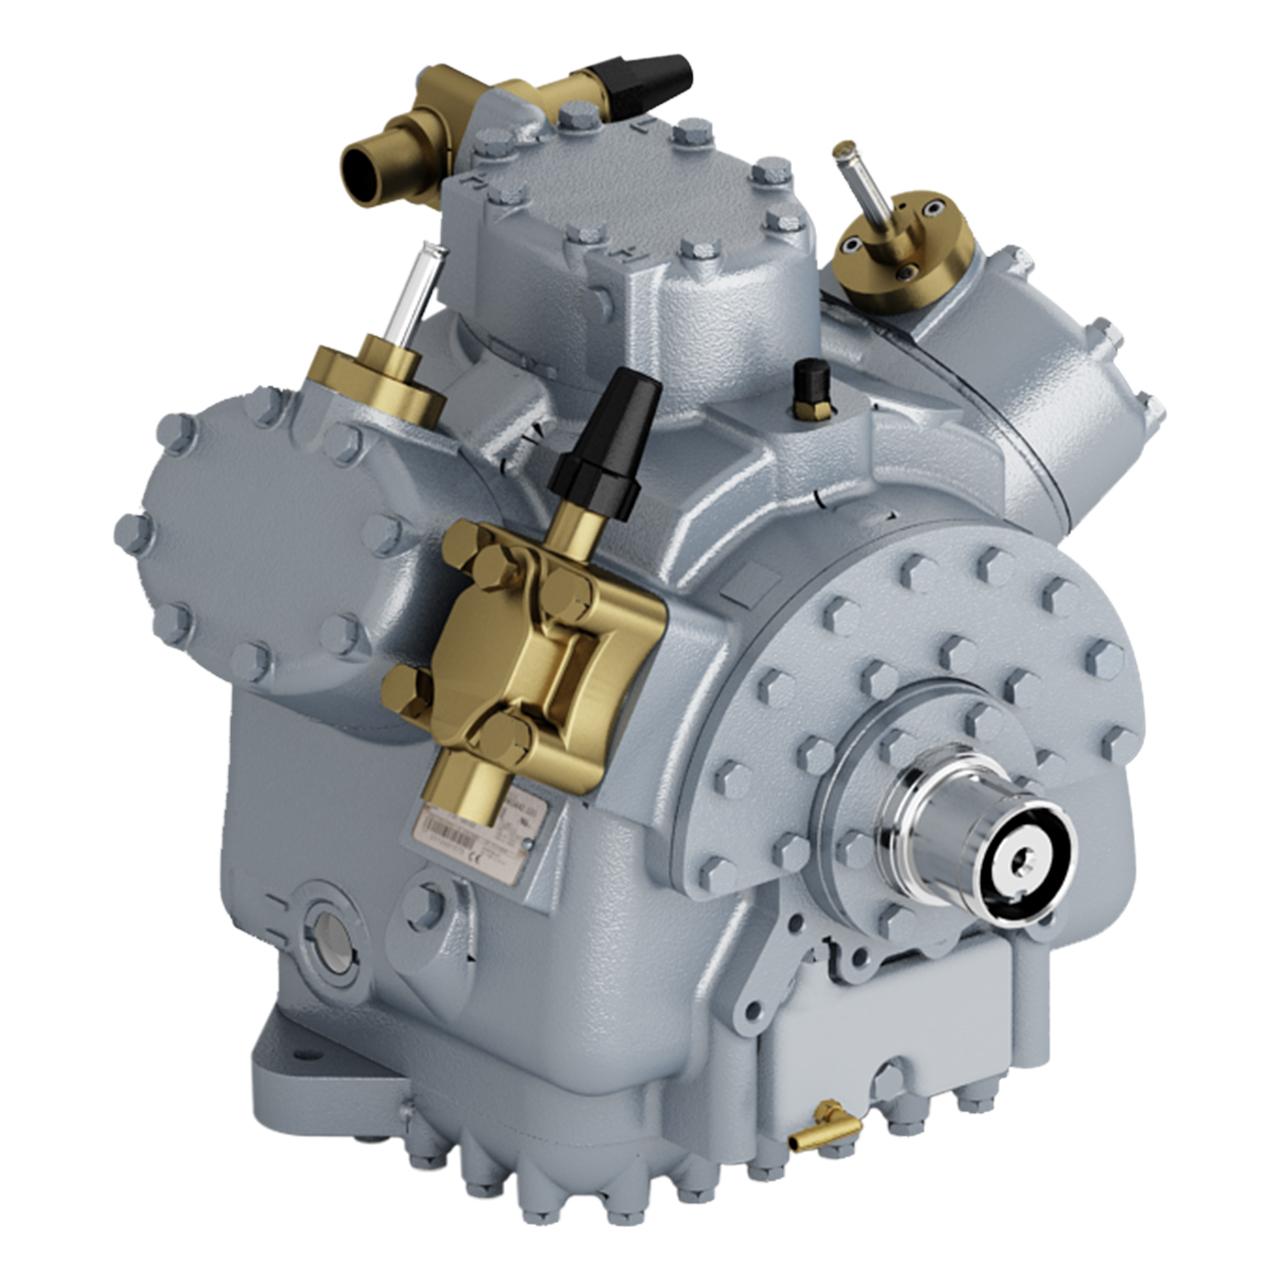 carlyle-compressor-5g